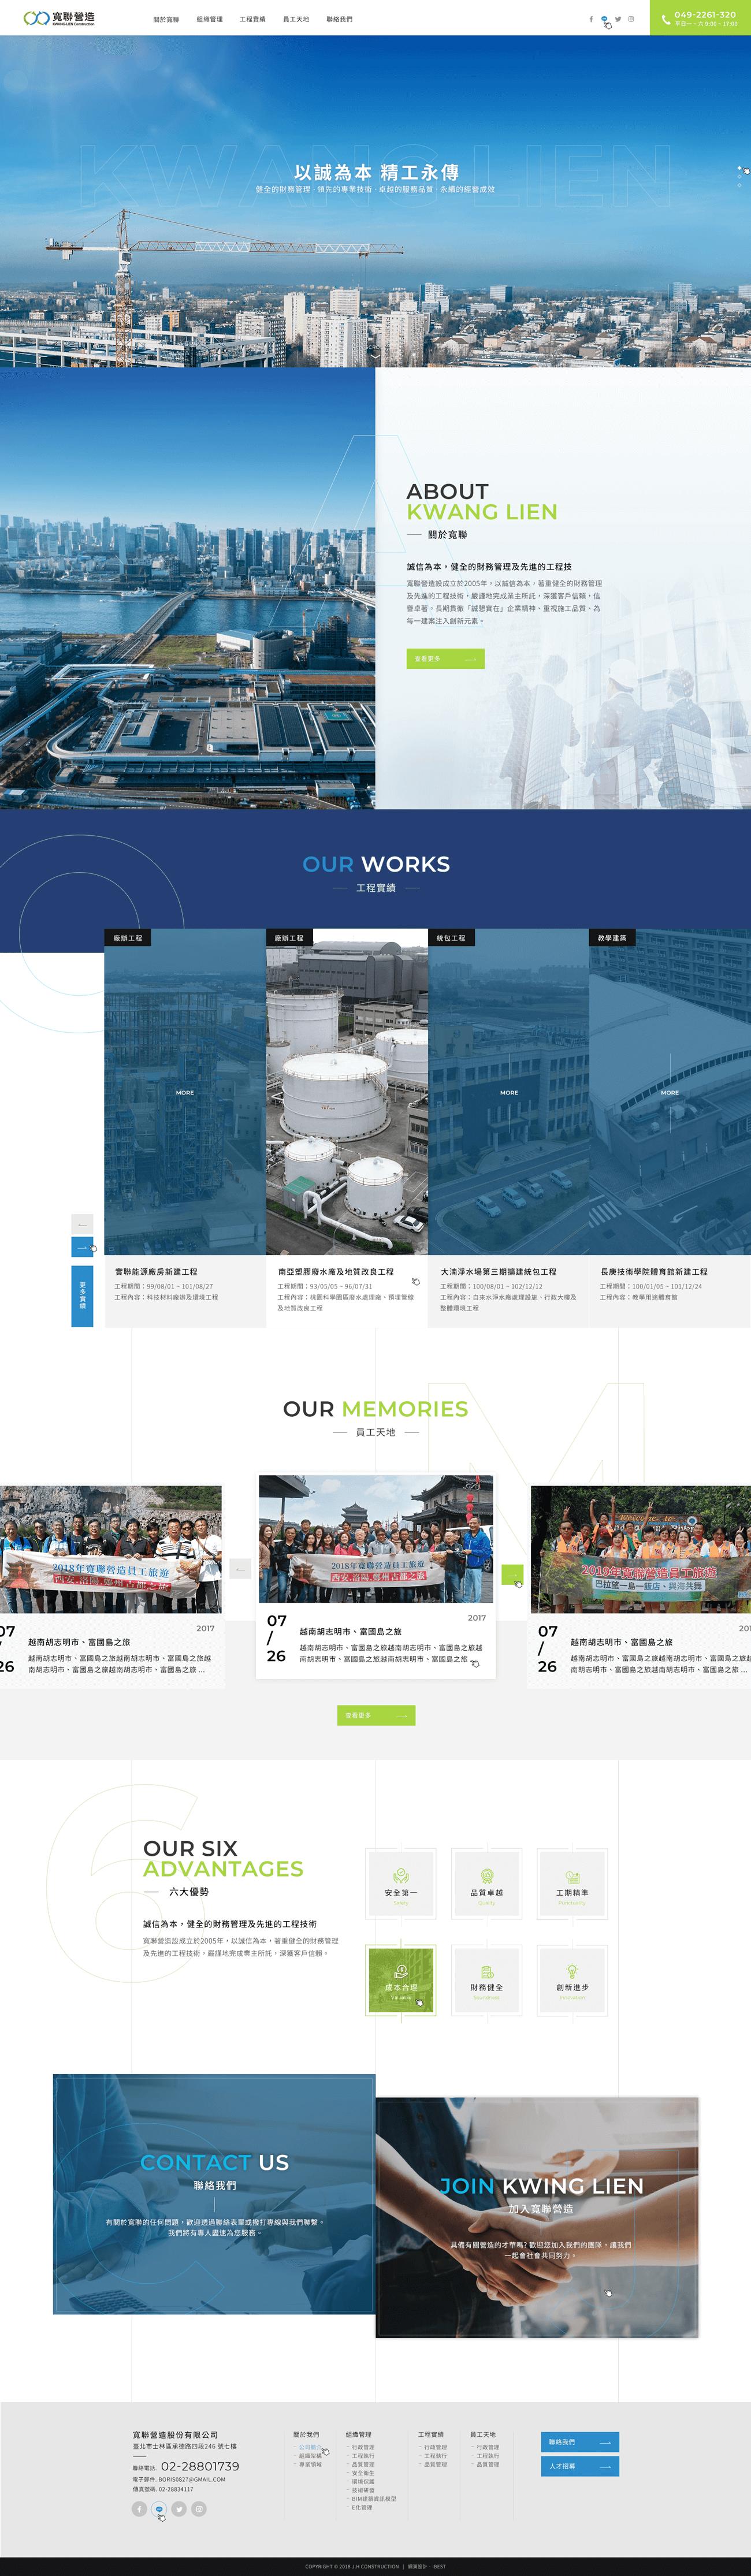 寬聯營造-網頁設計